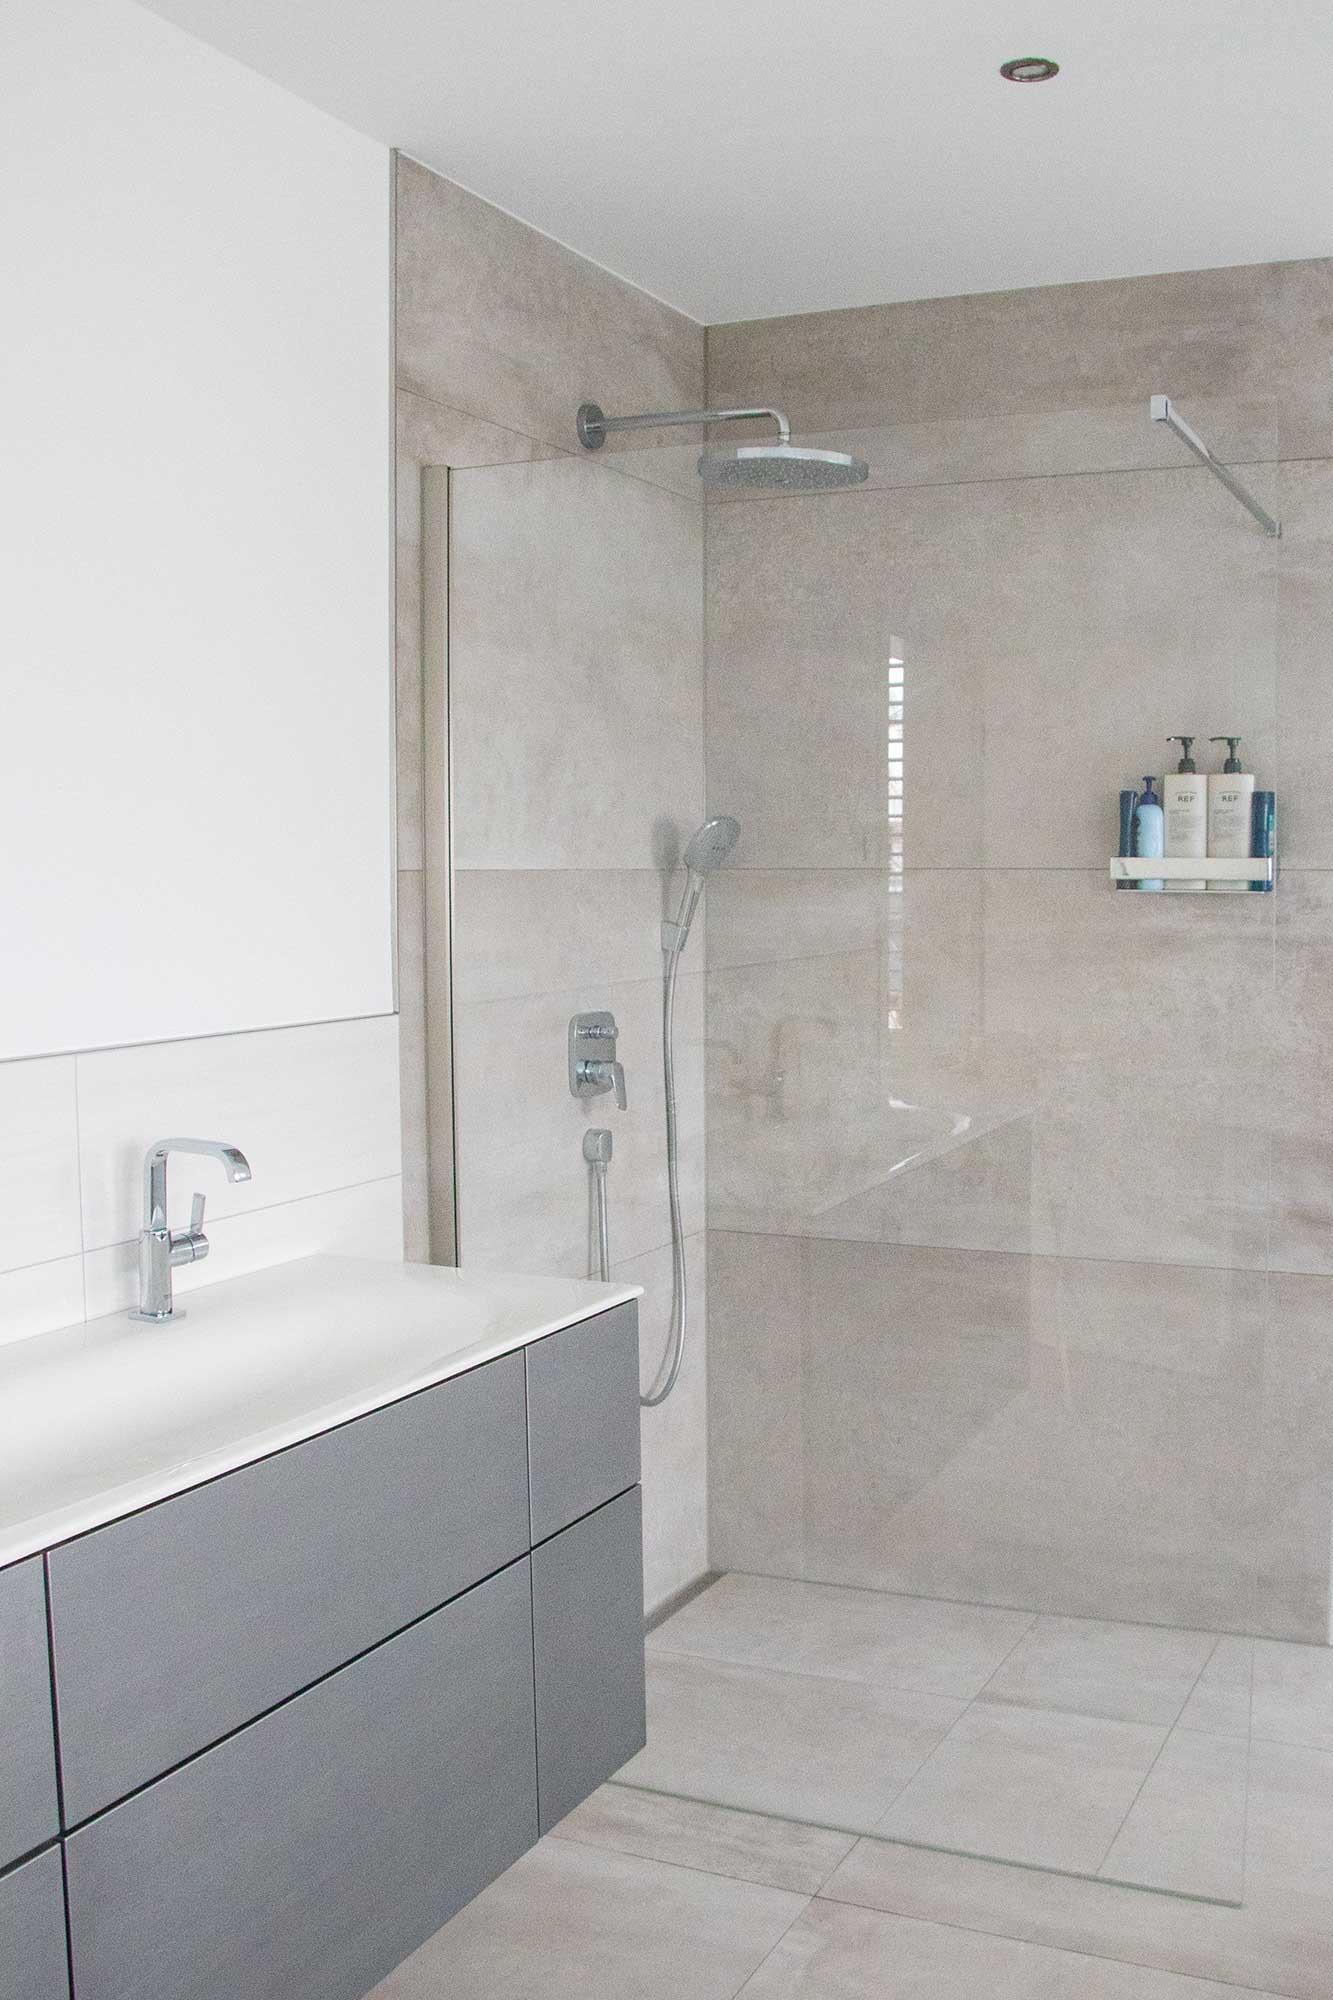 Betonoptik Fliesen im Badezimmer - Fliesen Vlady ...